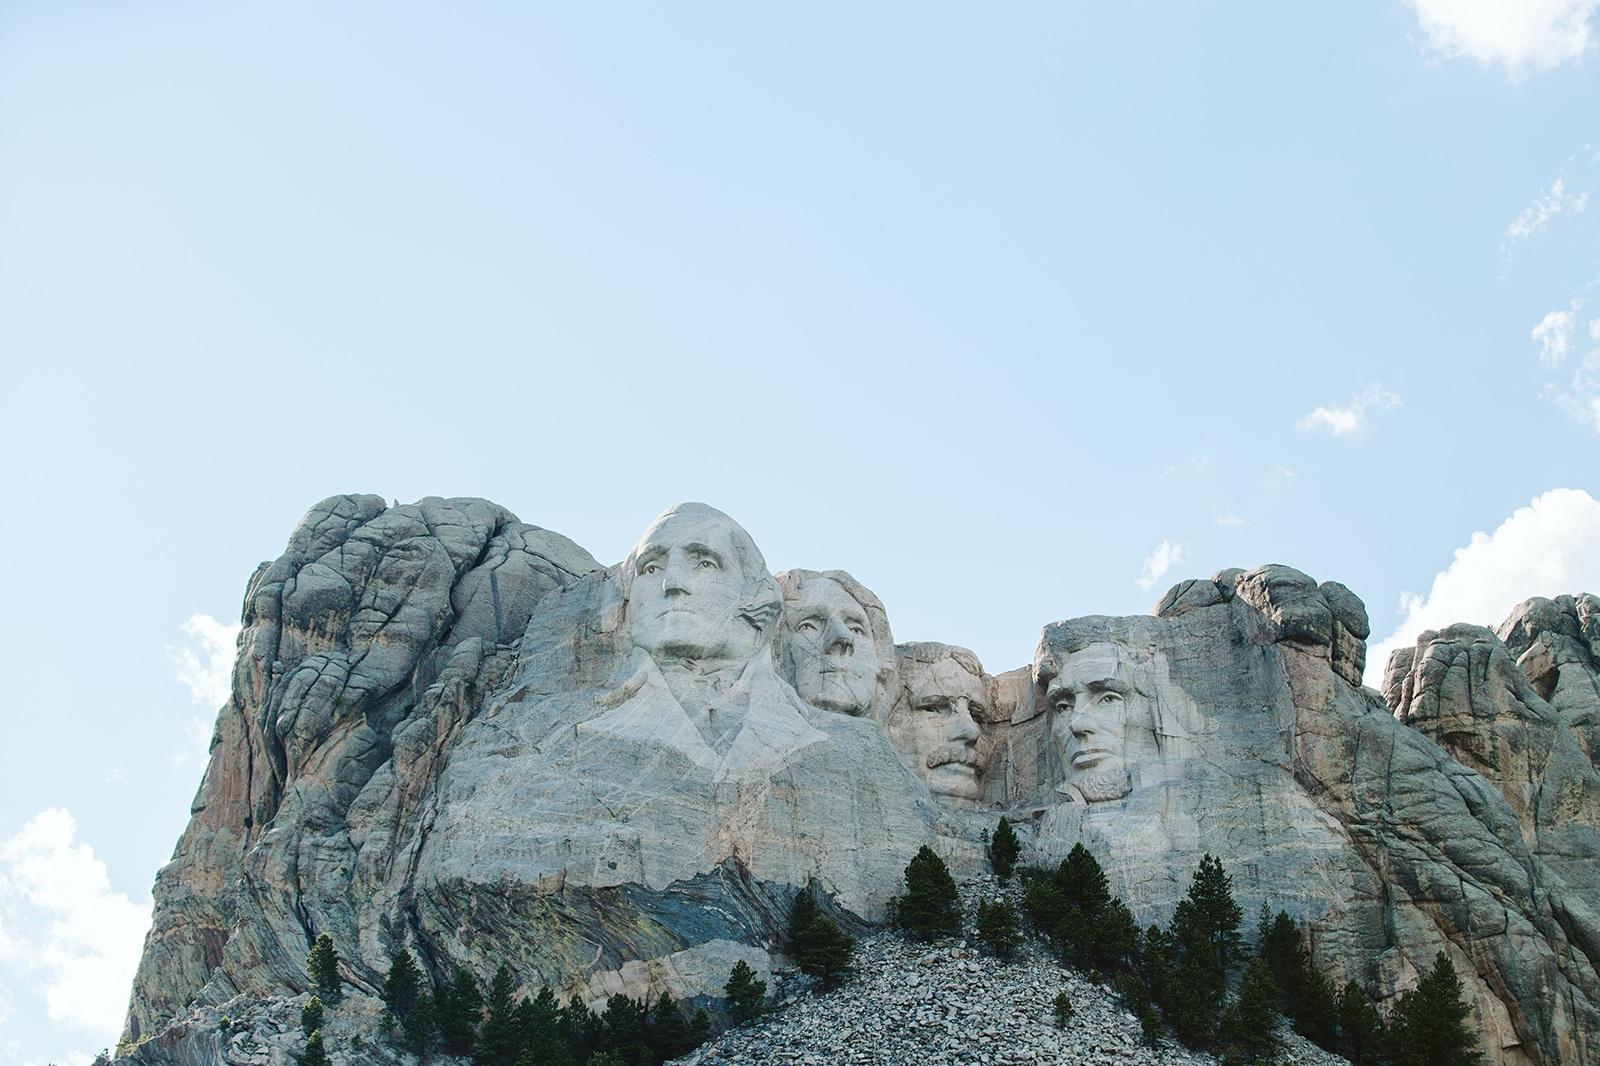 Under Canvas - Mt. Rushmore, South Dakota